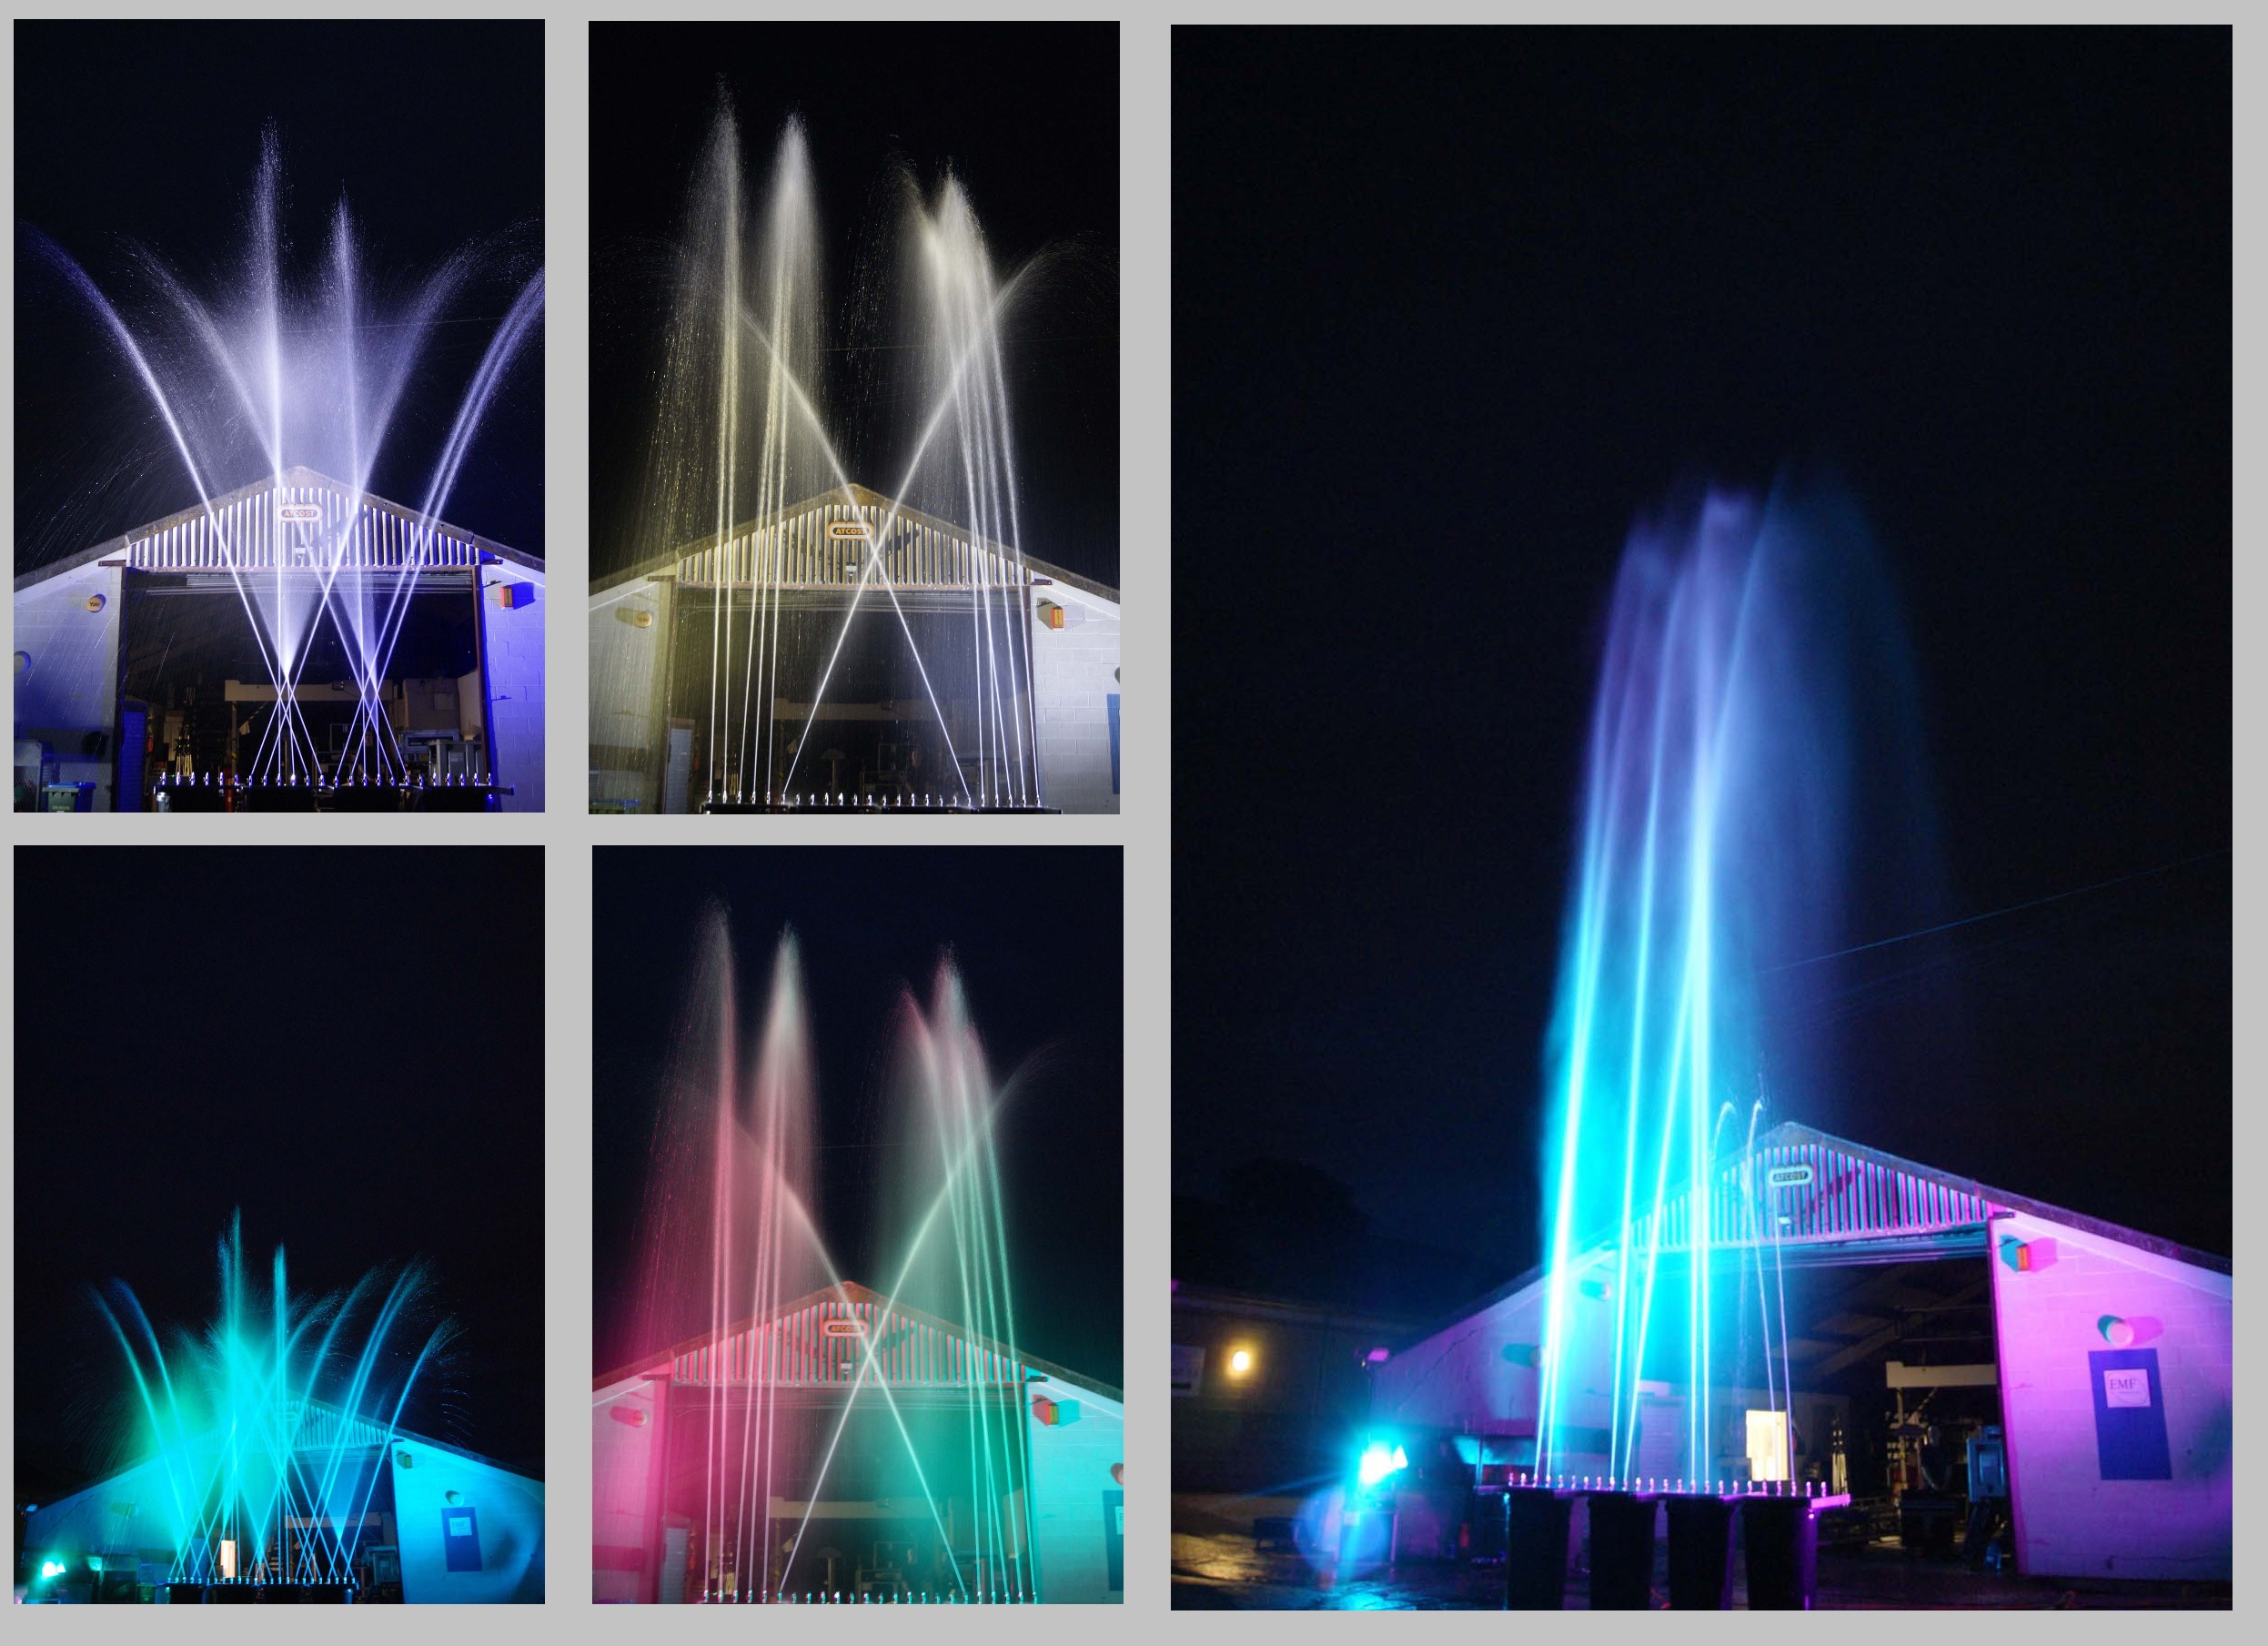 Animated Jet Fountains for European Theme Park